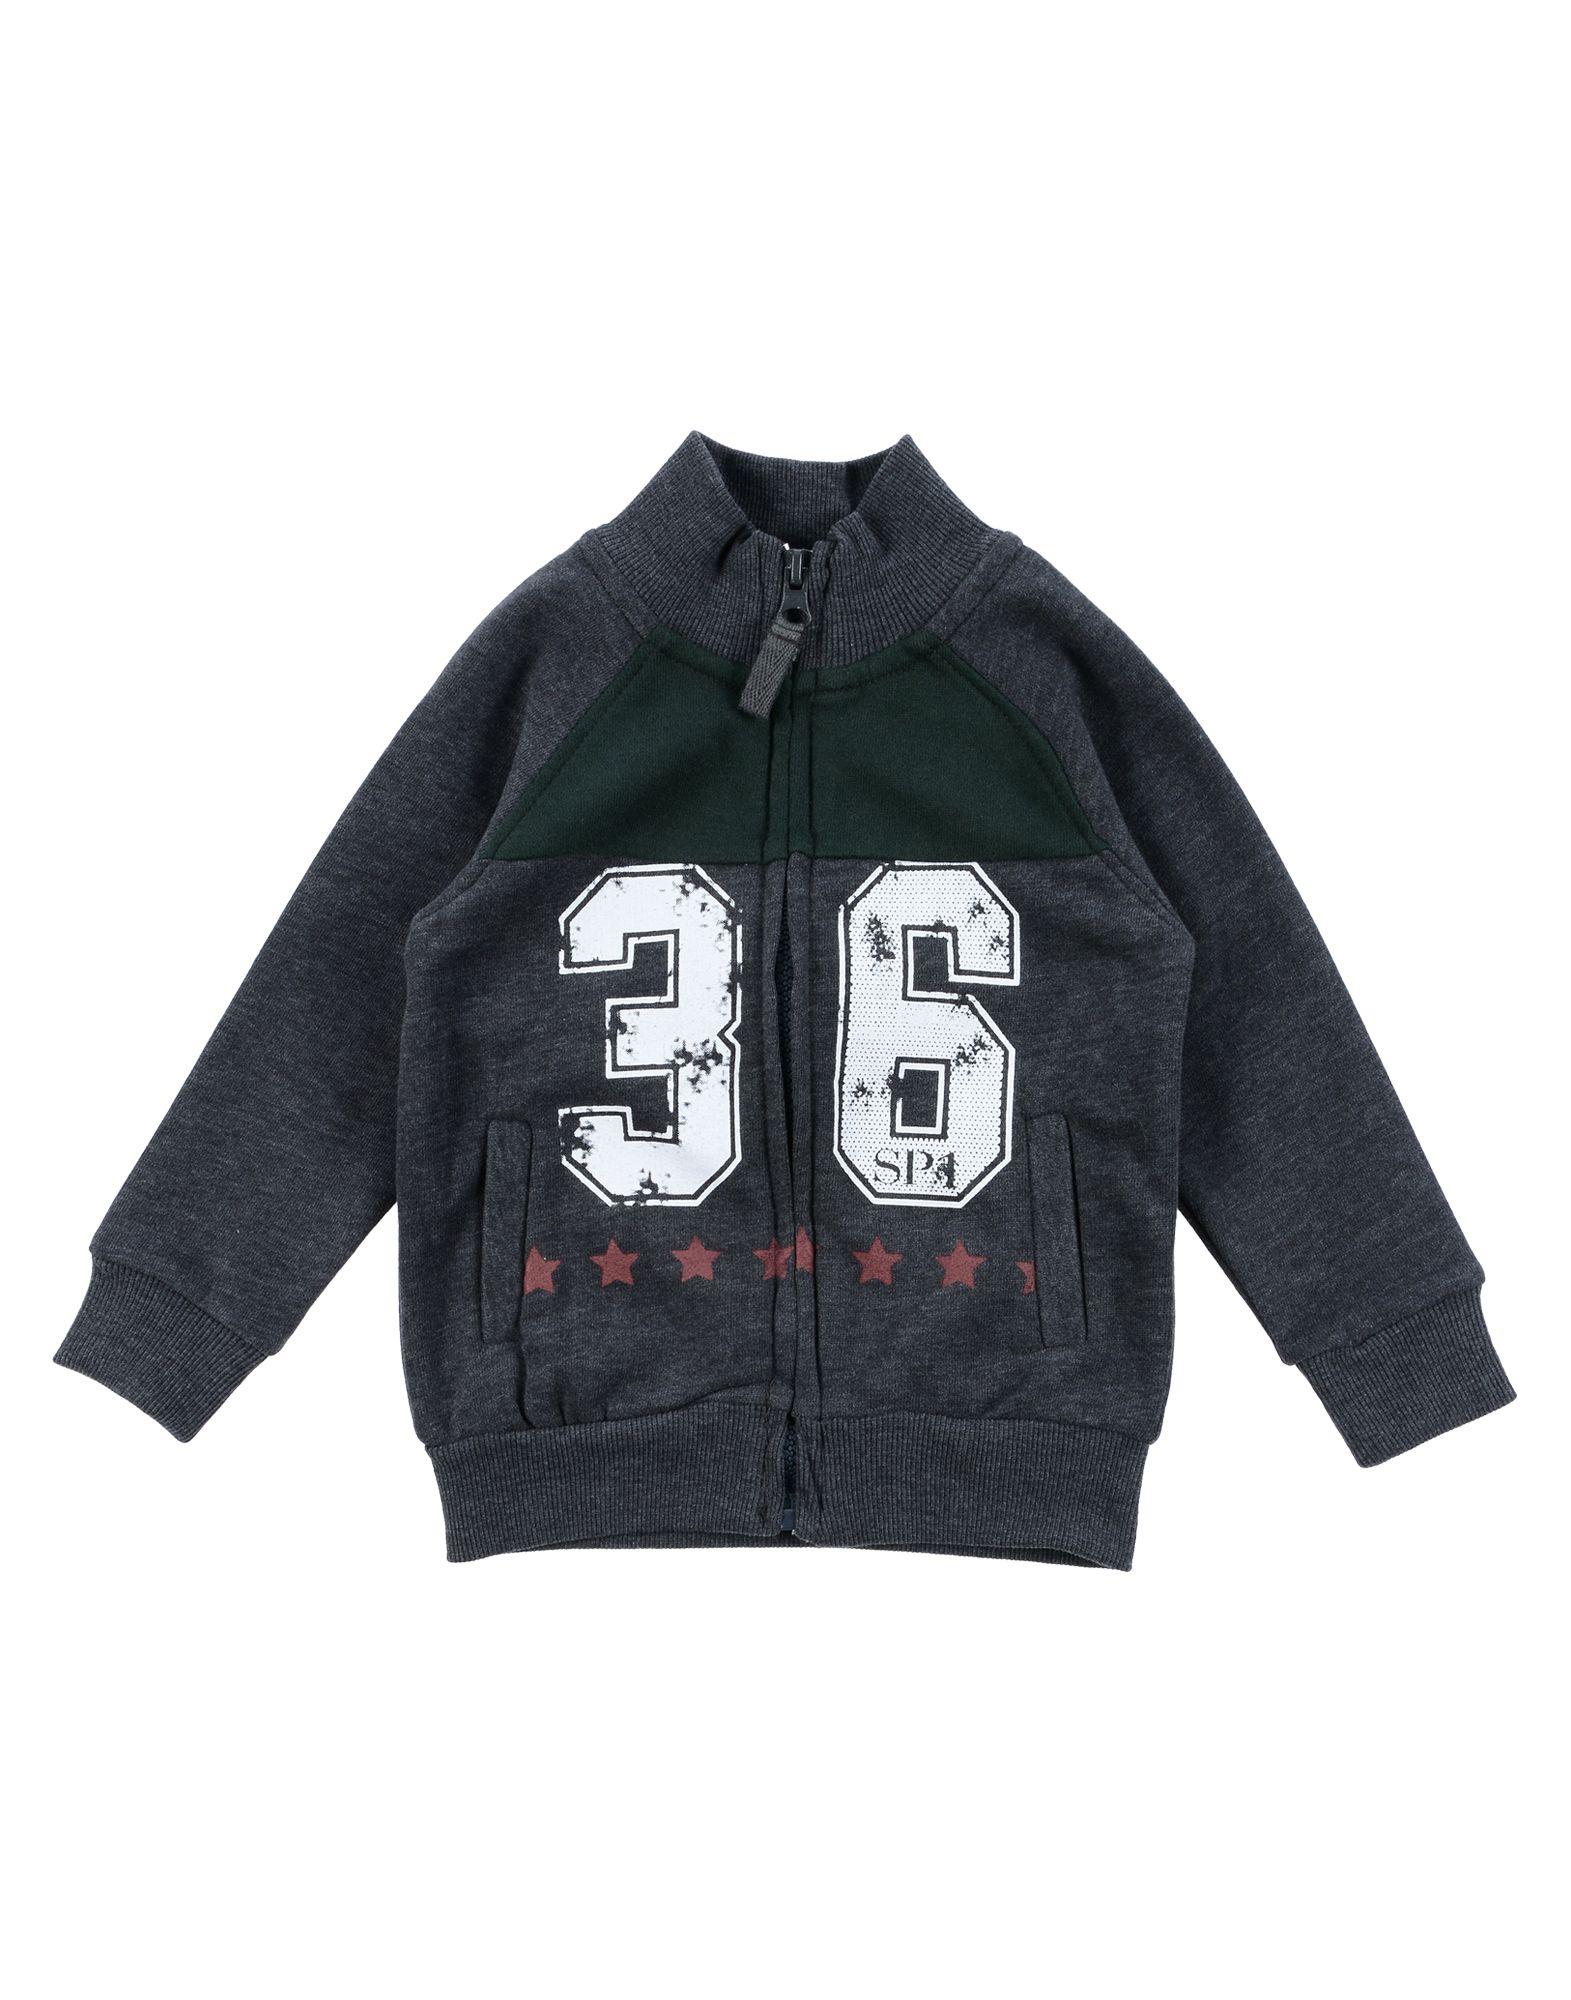 Sp1 Kids' Sweatshirts In Gray